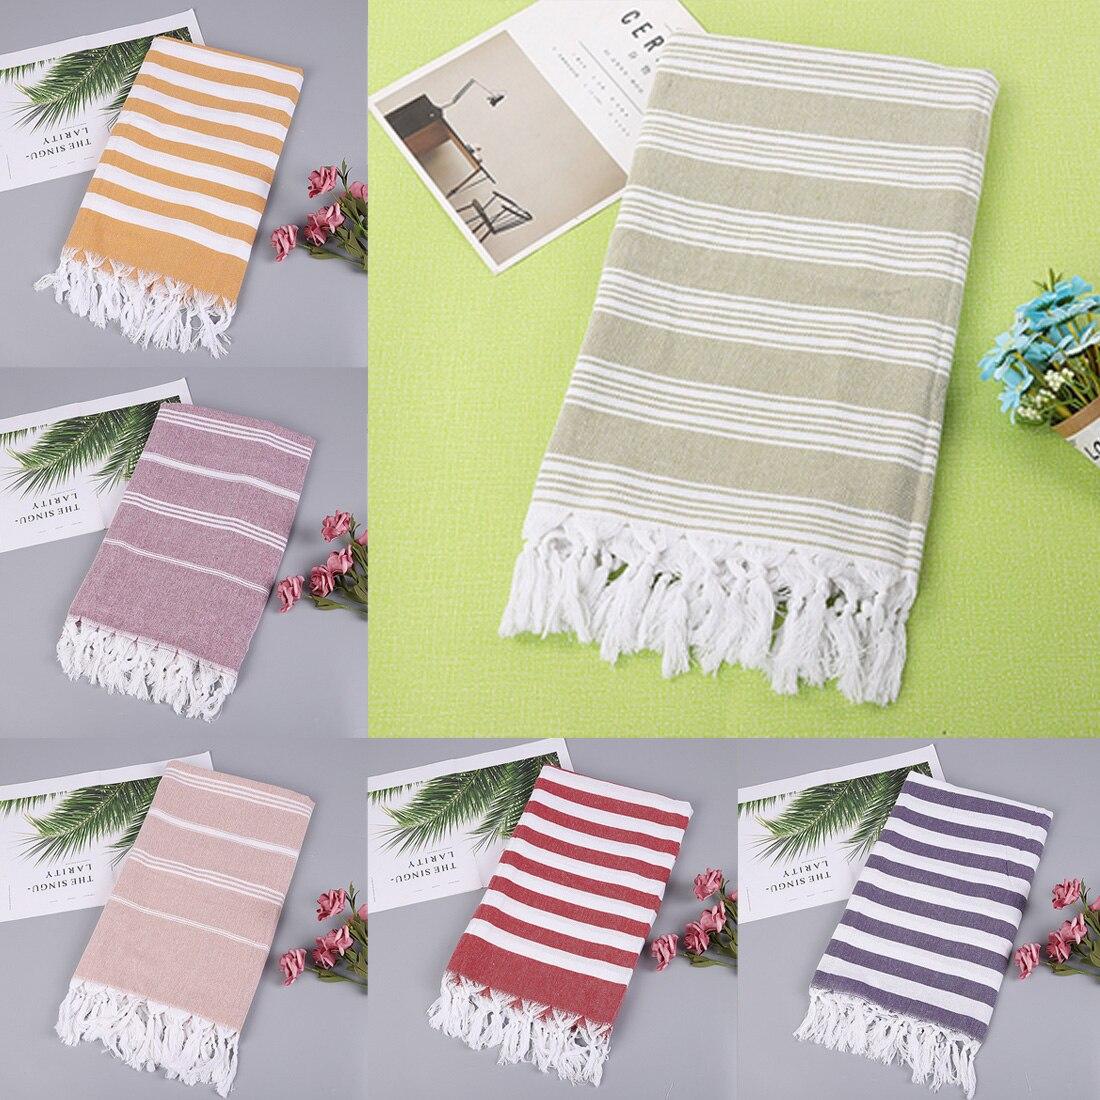 100*180 Cm Turkish Beach Towels 100% Cotton Stripes Thin